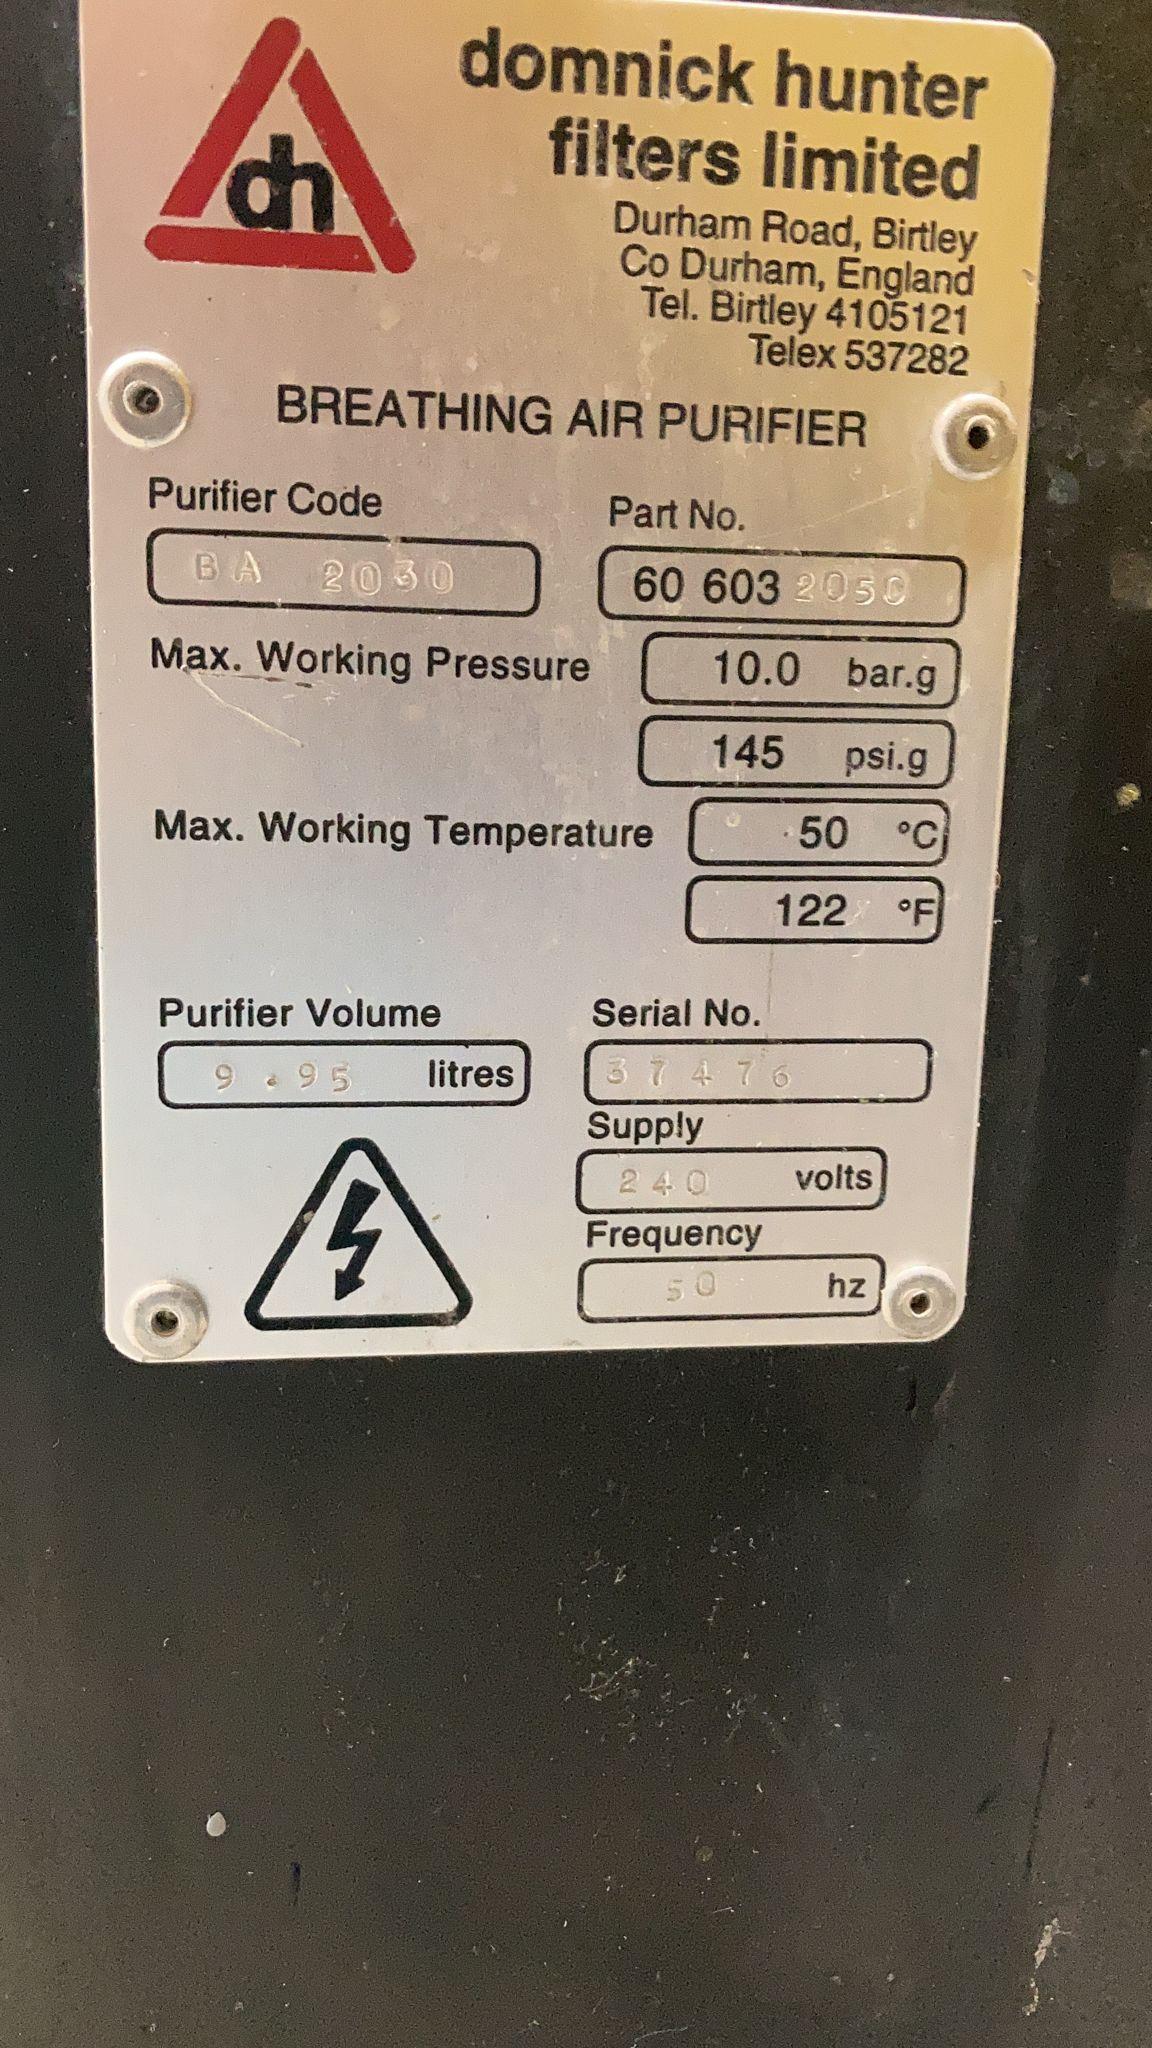 Domnick Hunter BA2030 Breathing Air Purifier